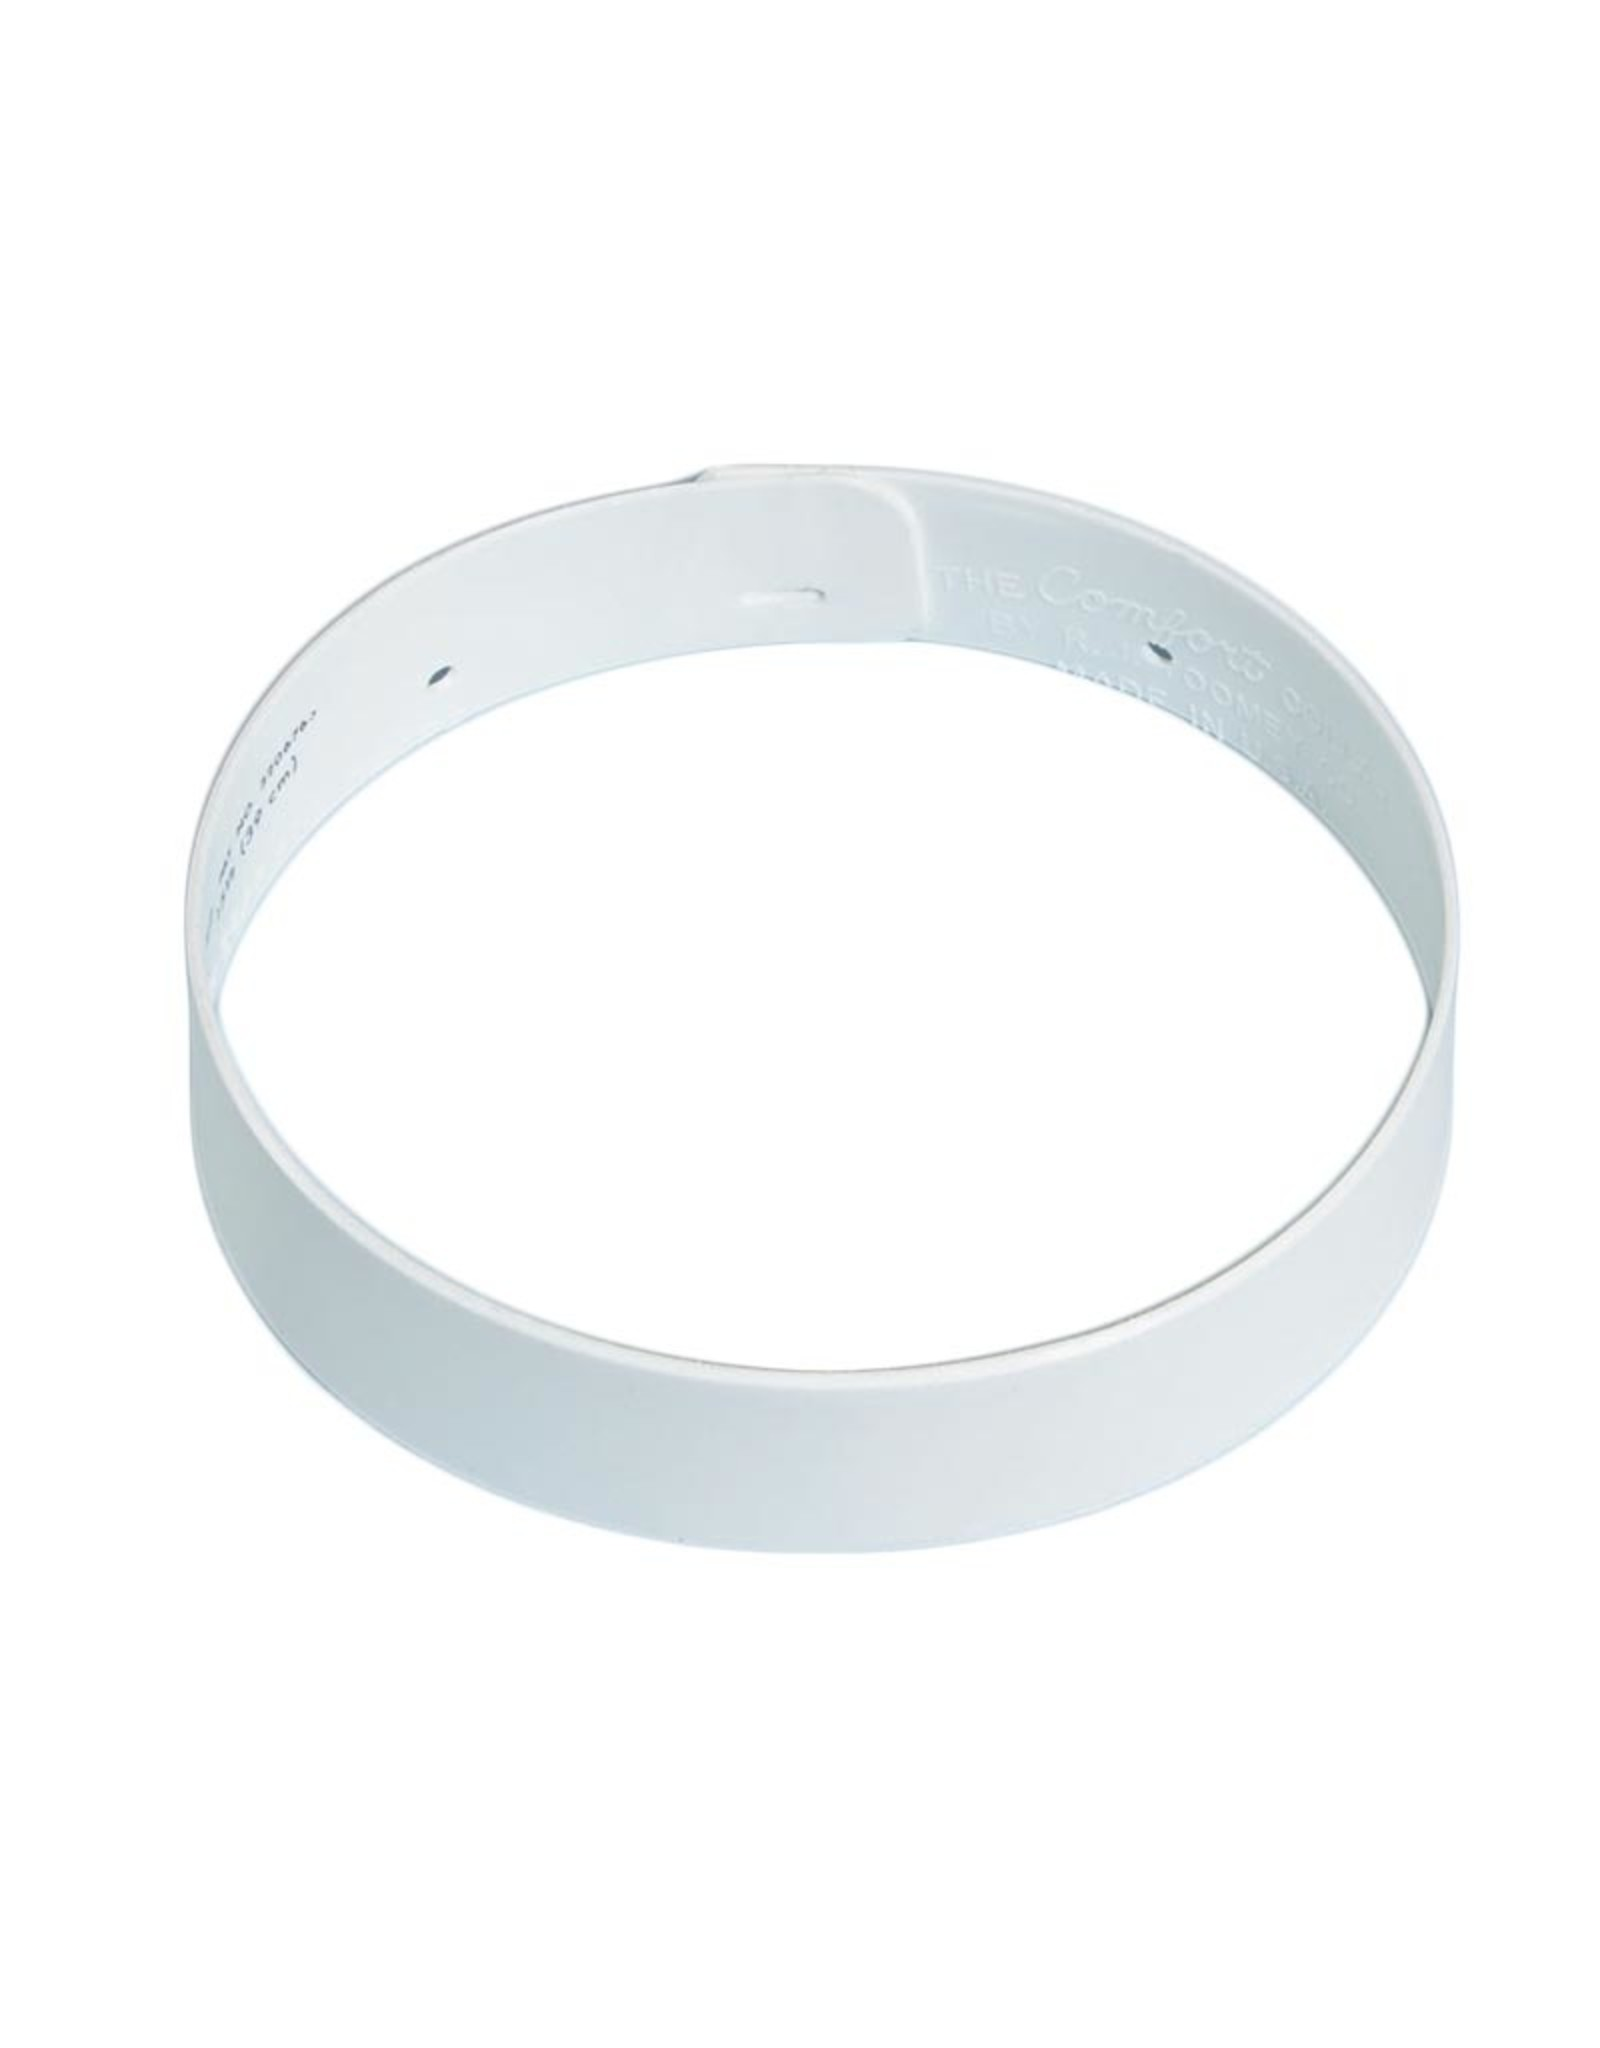 Single-Ply Comfort Collar 15.5 #1 Collar Height